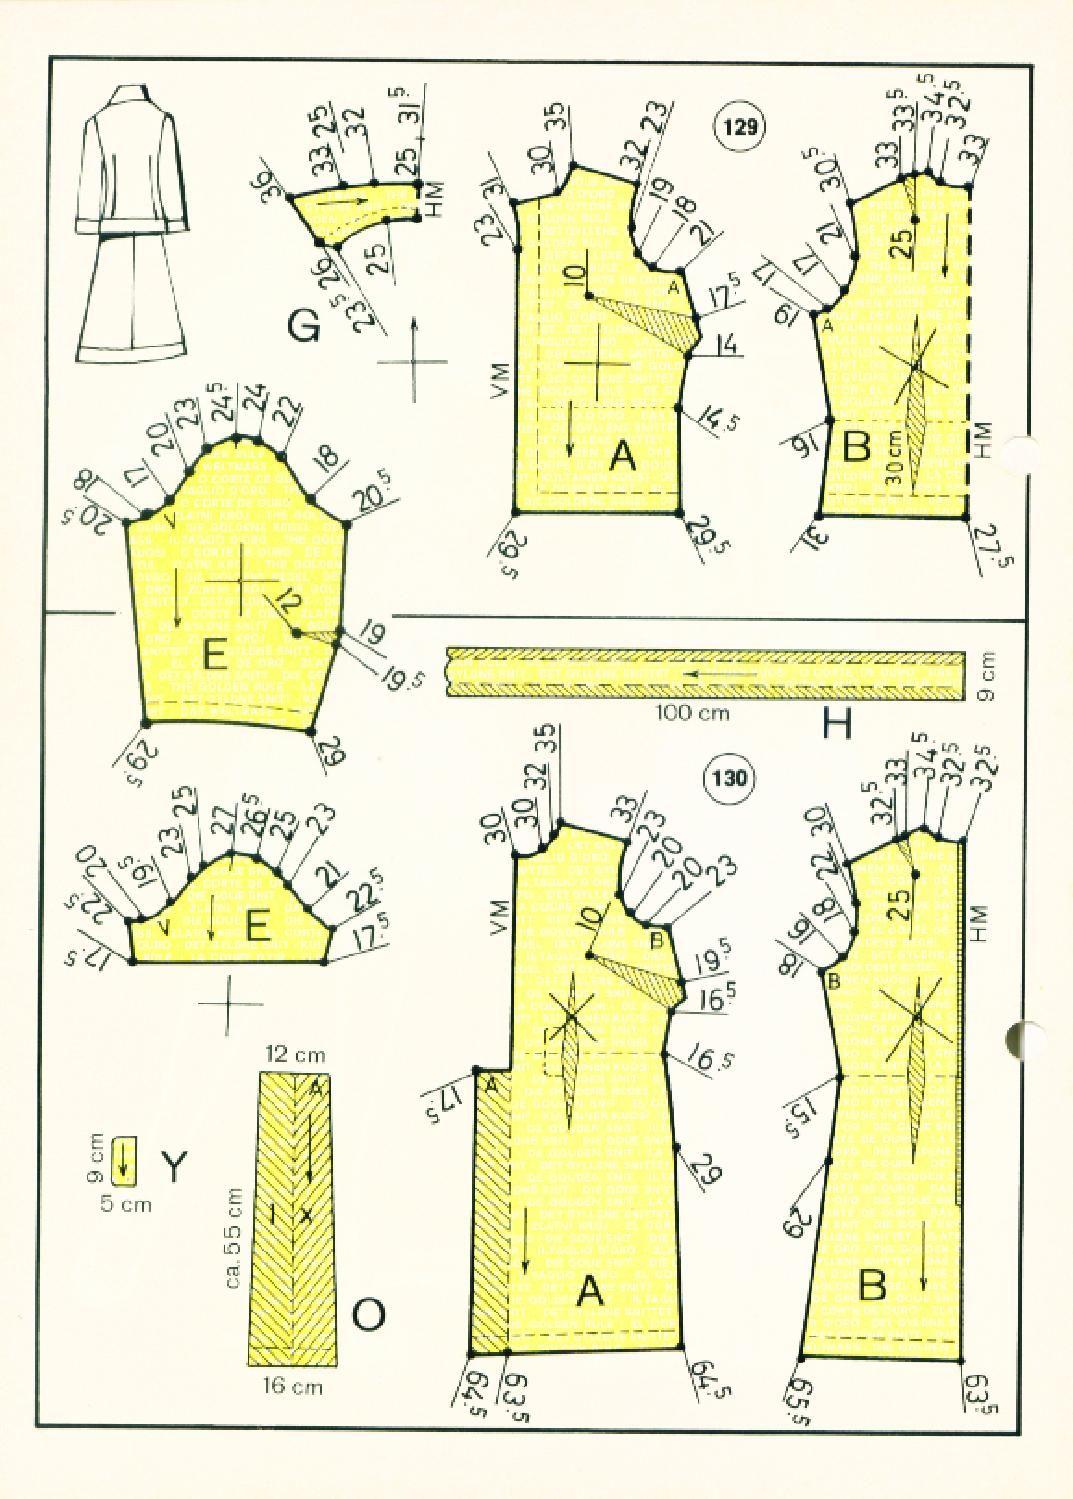 Vintage Sewing Patterns 127 winter 1972 Patternmaking | MOLDERIA ...